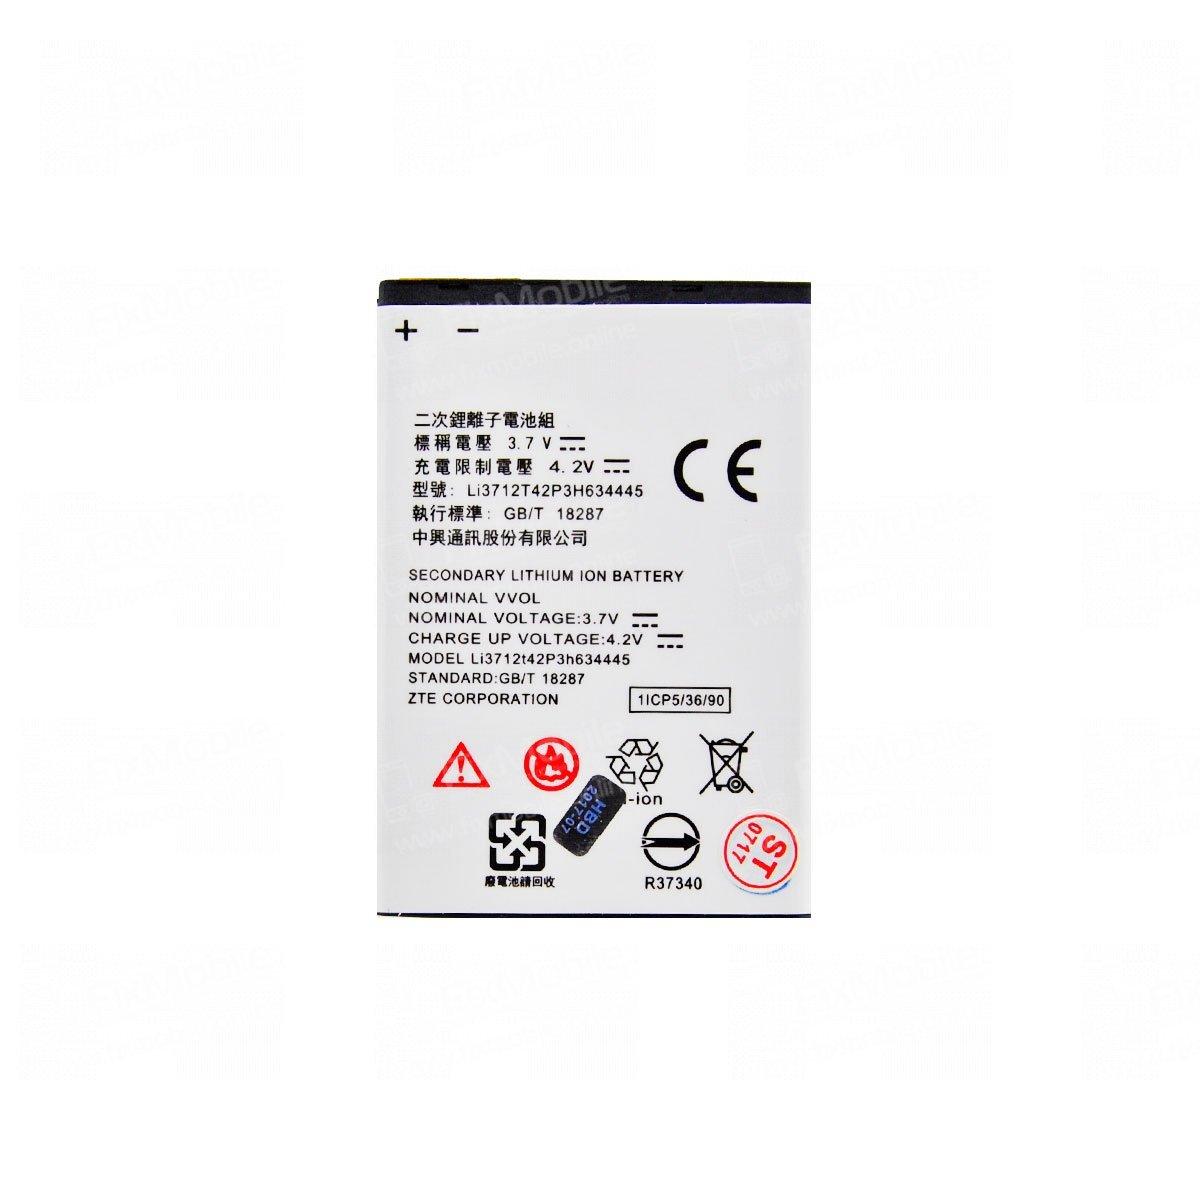 Аккумуляторная батарея для МТС Smart Start LI3712T42P3H634445